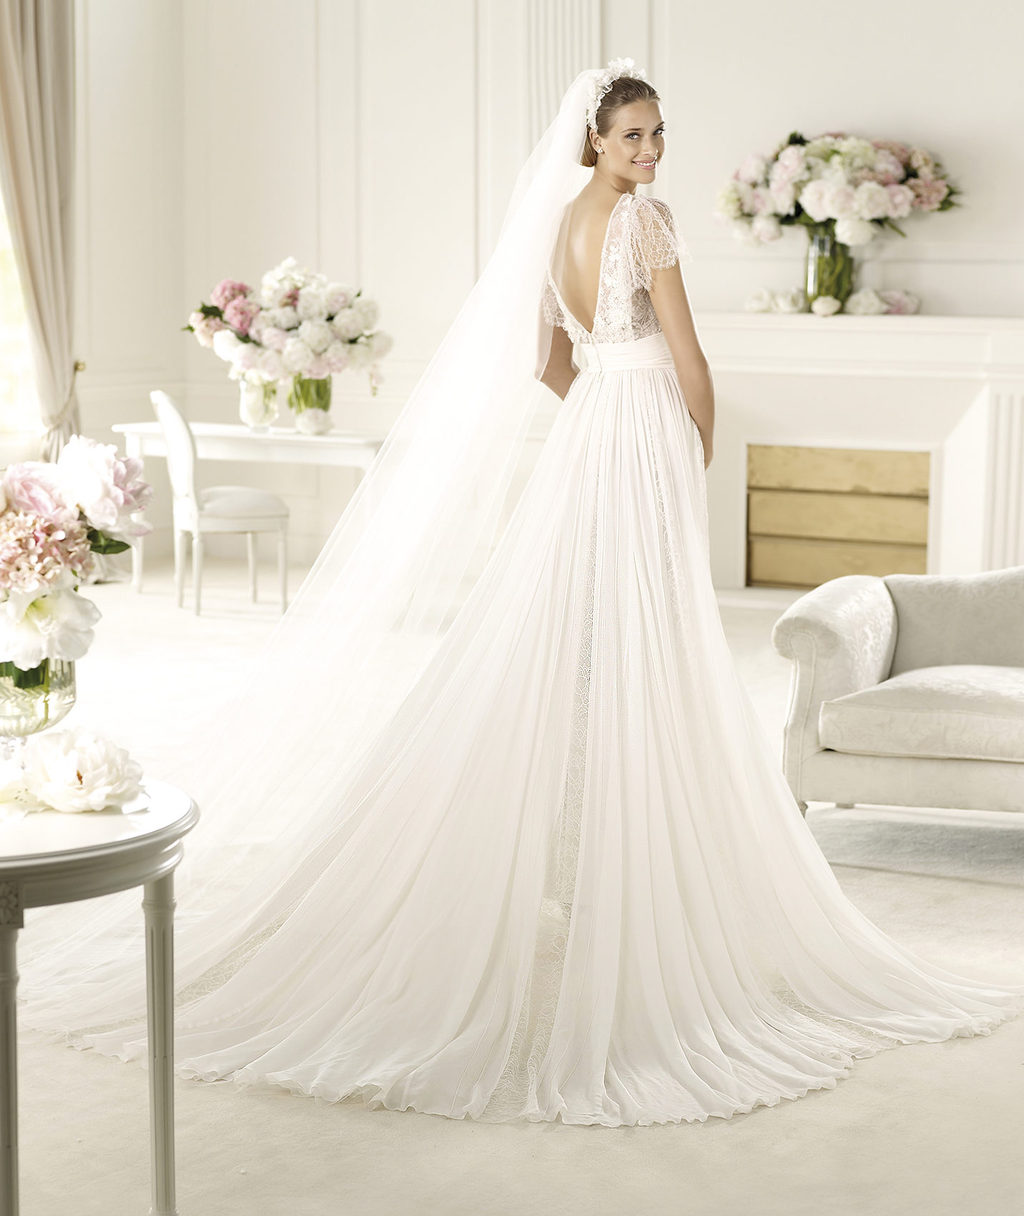 Startling 2013 Elie Saab Wedding Dress Lorraine Elie Saab Wedding Dress Stores Miami Elie Saab Wedding Dresses Sale wedding dress Elie Saab Wedding Dress